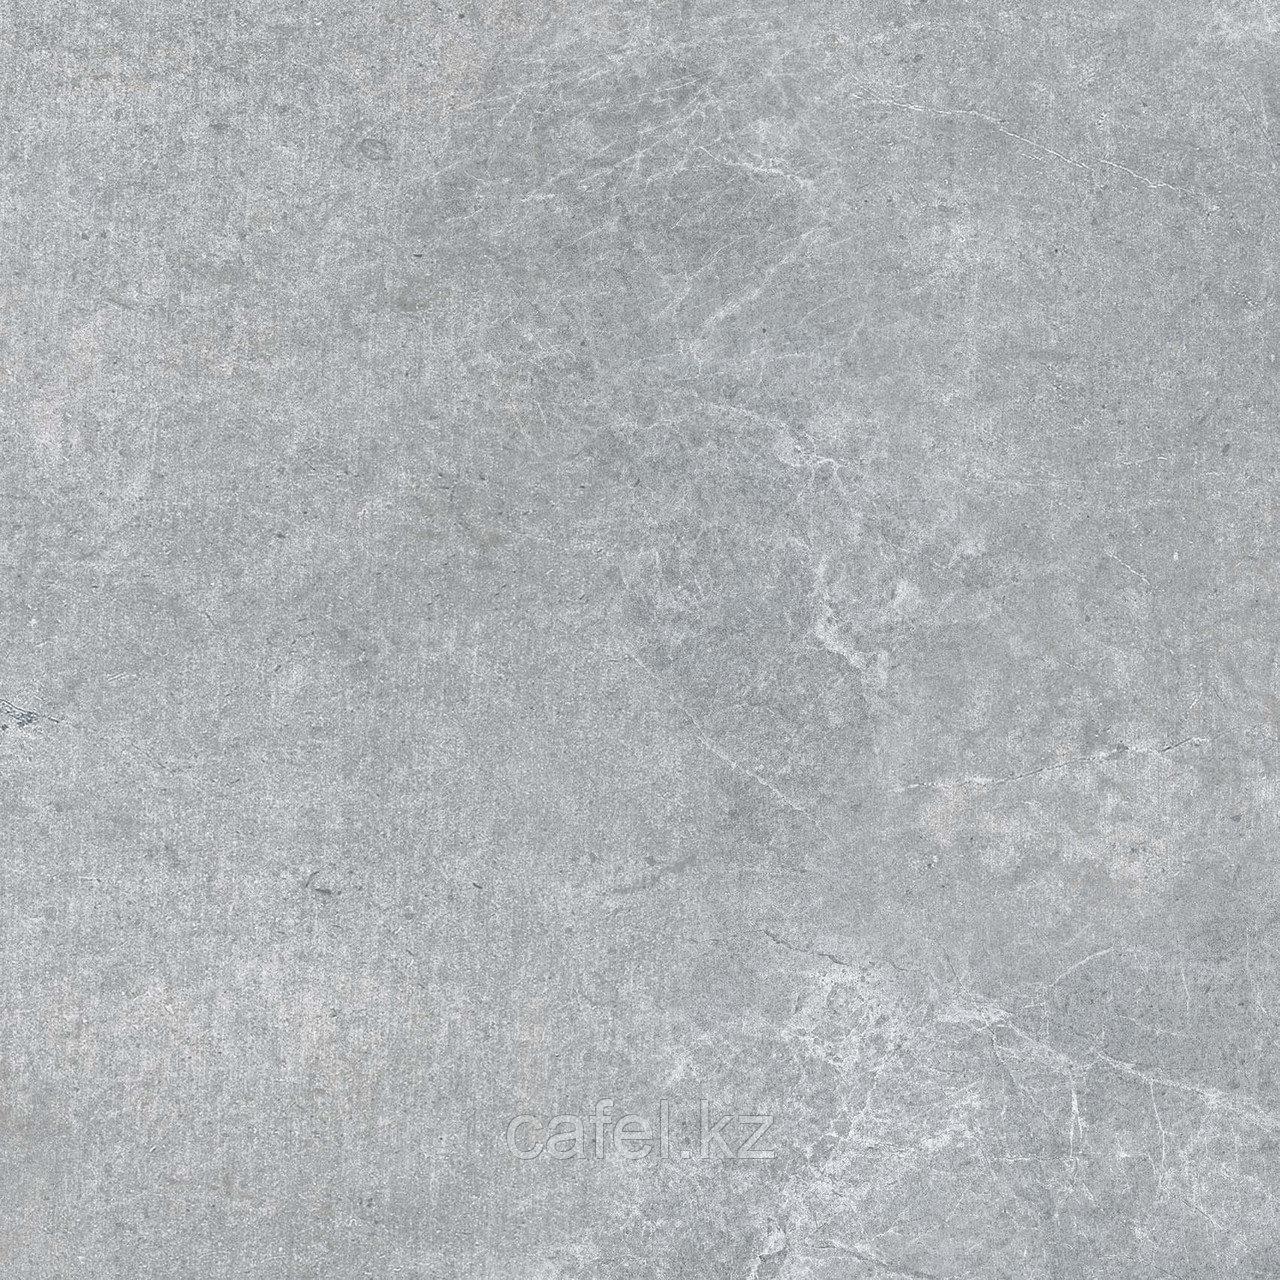 Керамогранит 60х60 Париж | Paris темно-серый